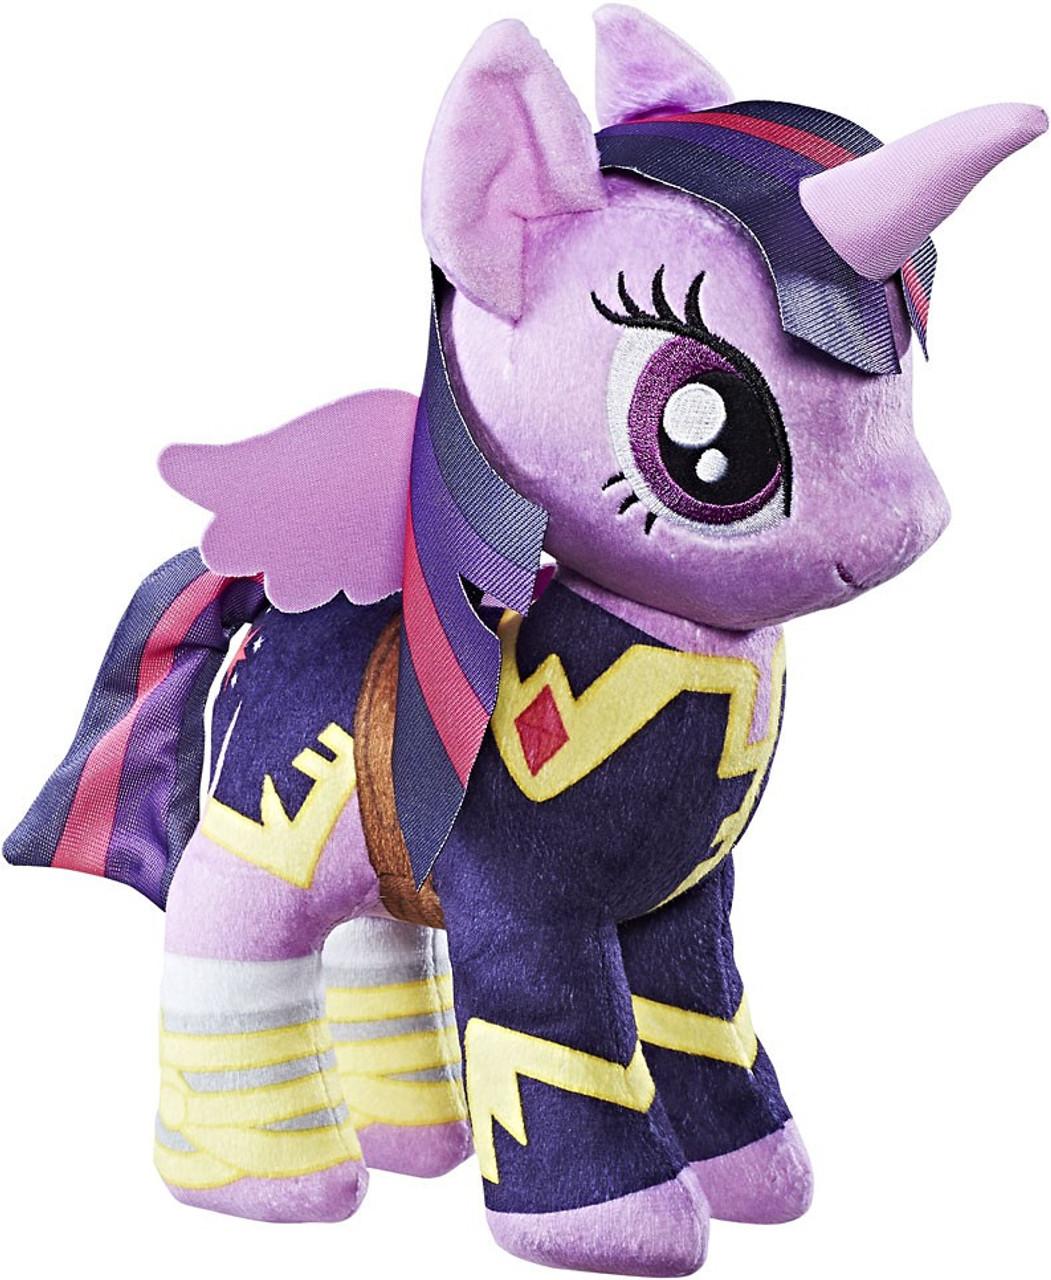 - My Little Pony Soft Twilight Sparkle Pirate 9 Plush Hasbro Toys